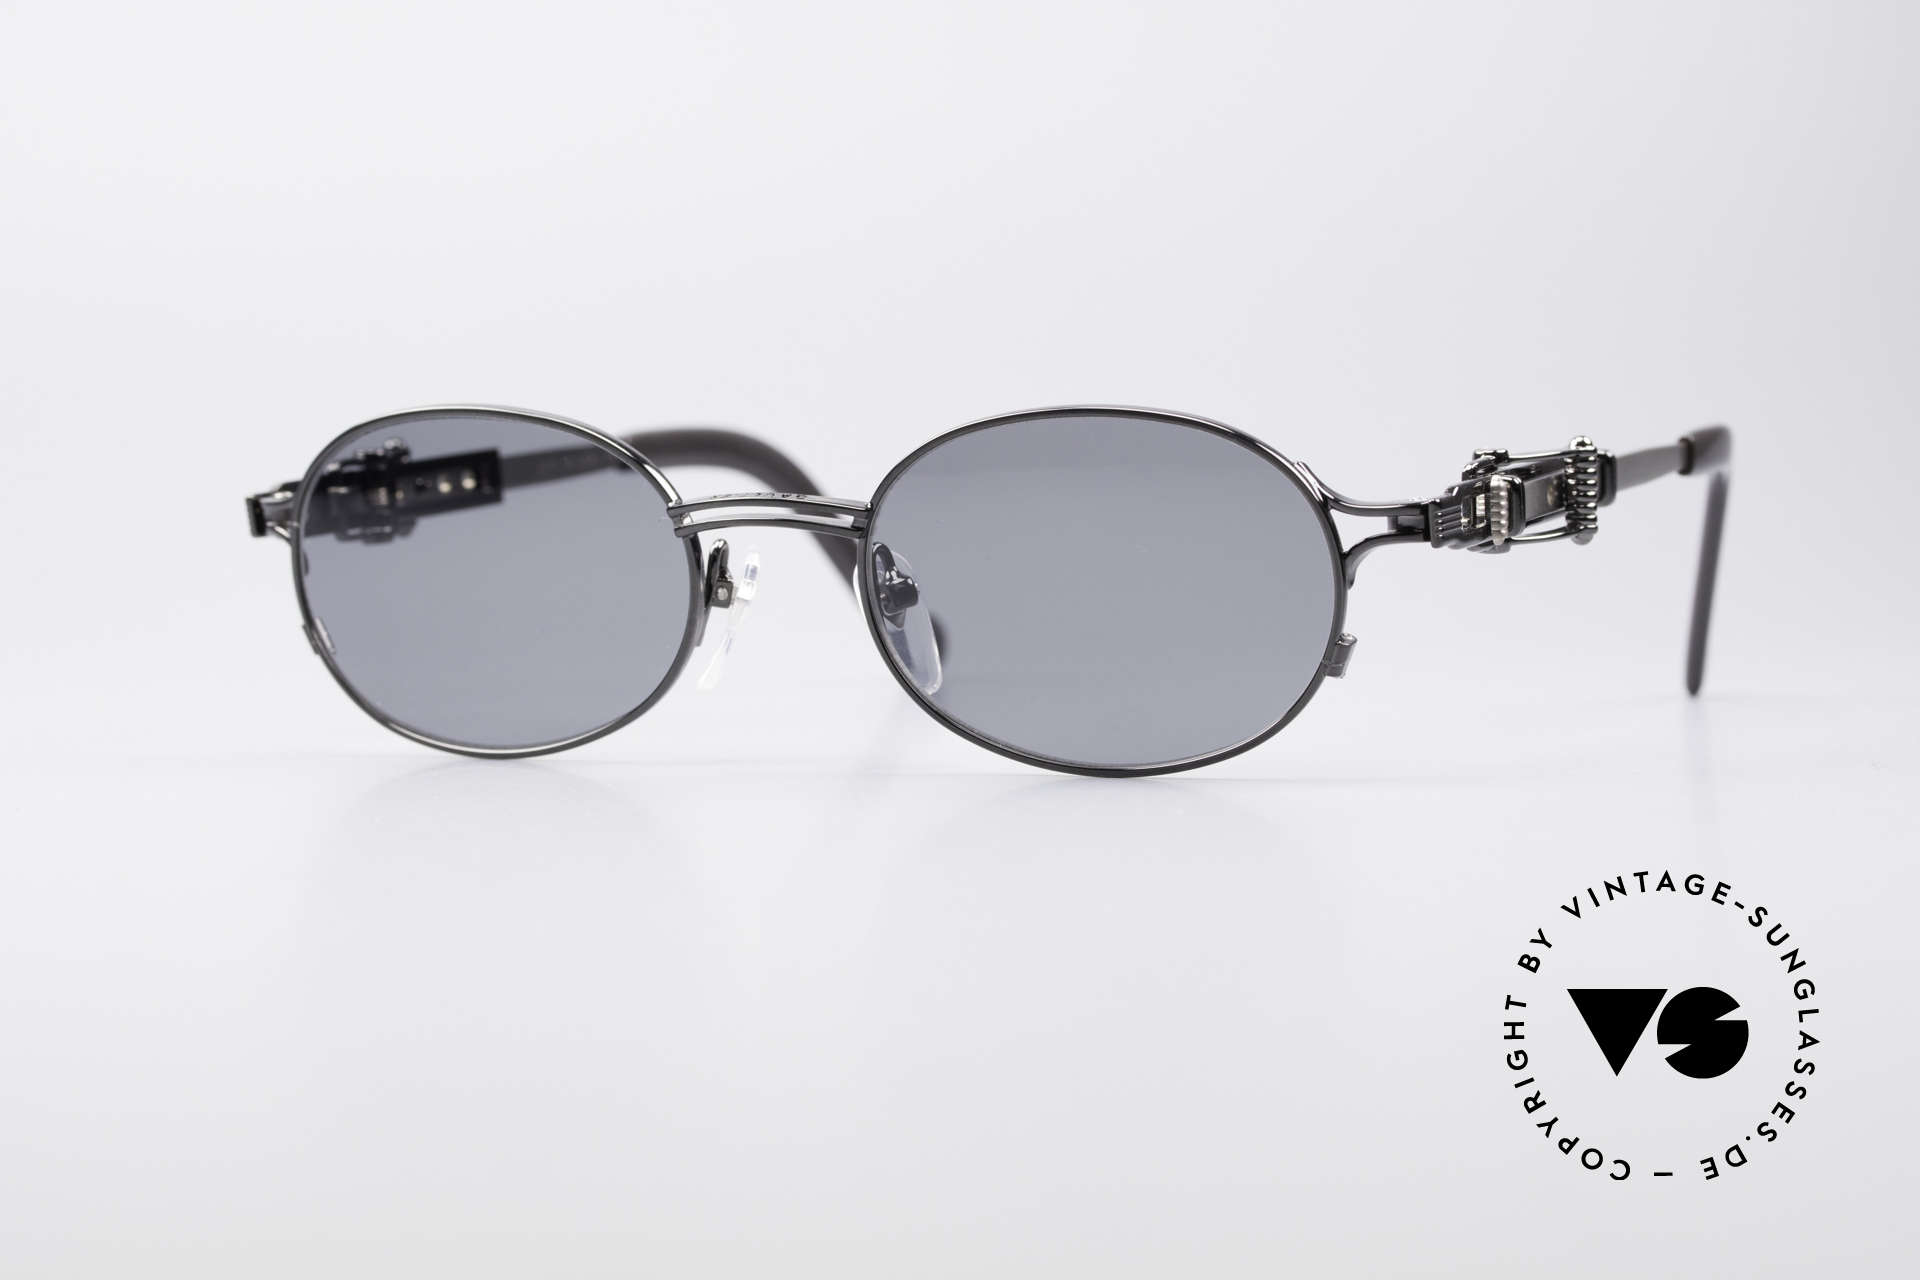 Jean Paul Gaultier 56-0020 Ovale Gürtelschnalle Brille, vintage Jean Paul GAULTIER Sonnenbrille von 1996/97, Passend für Herren